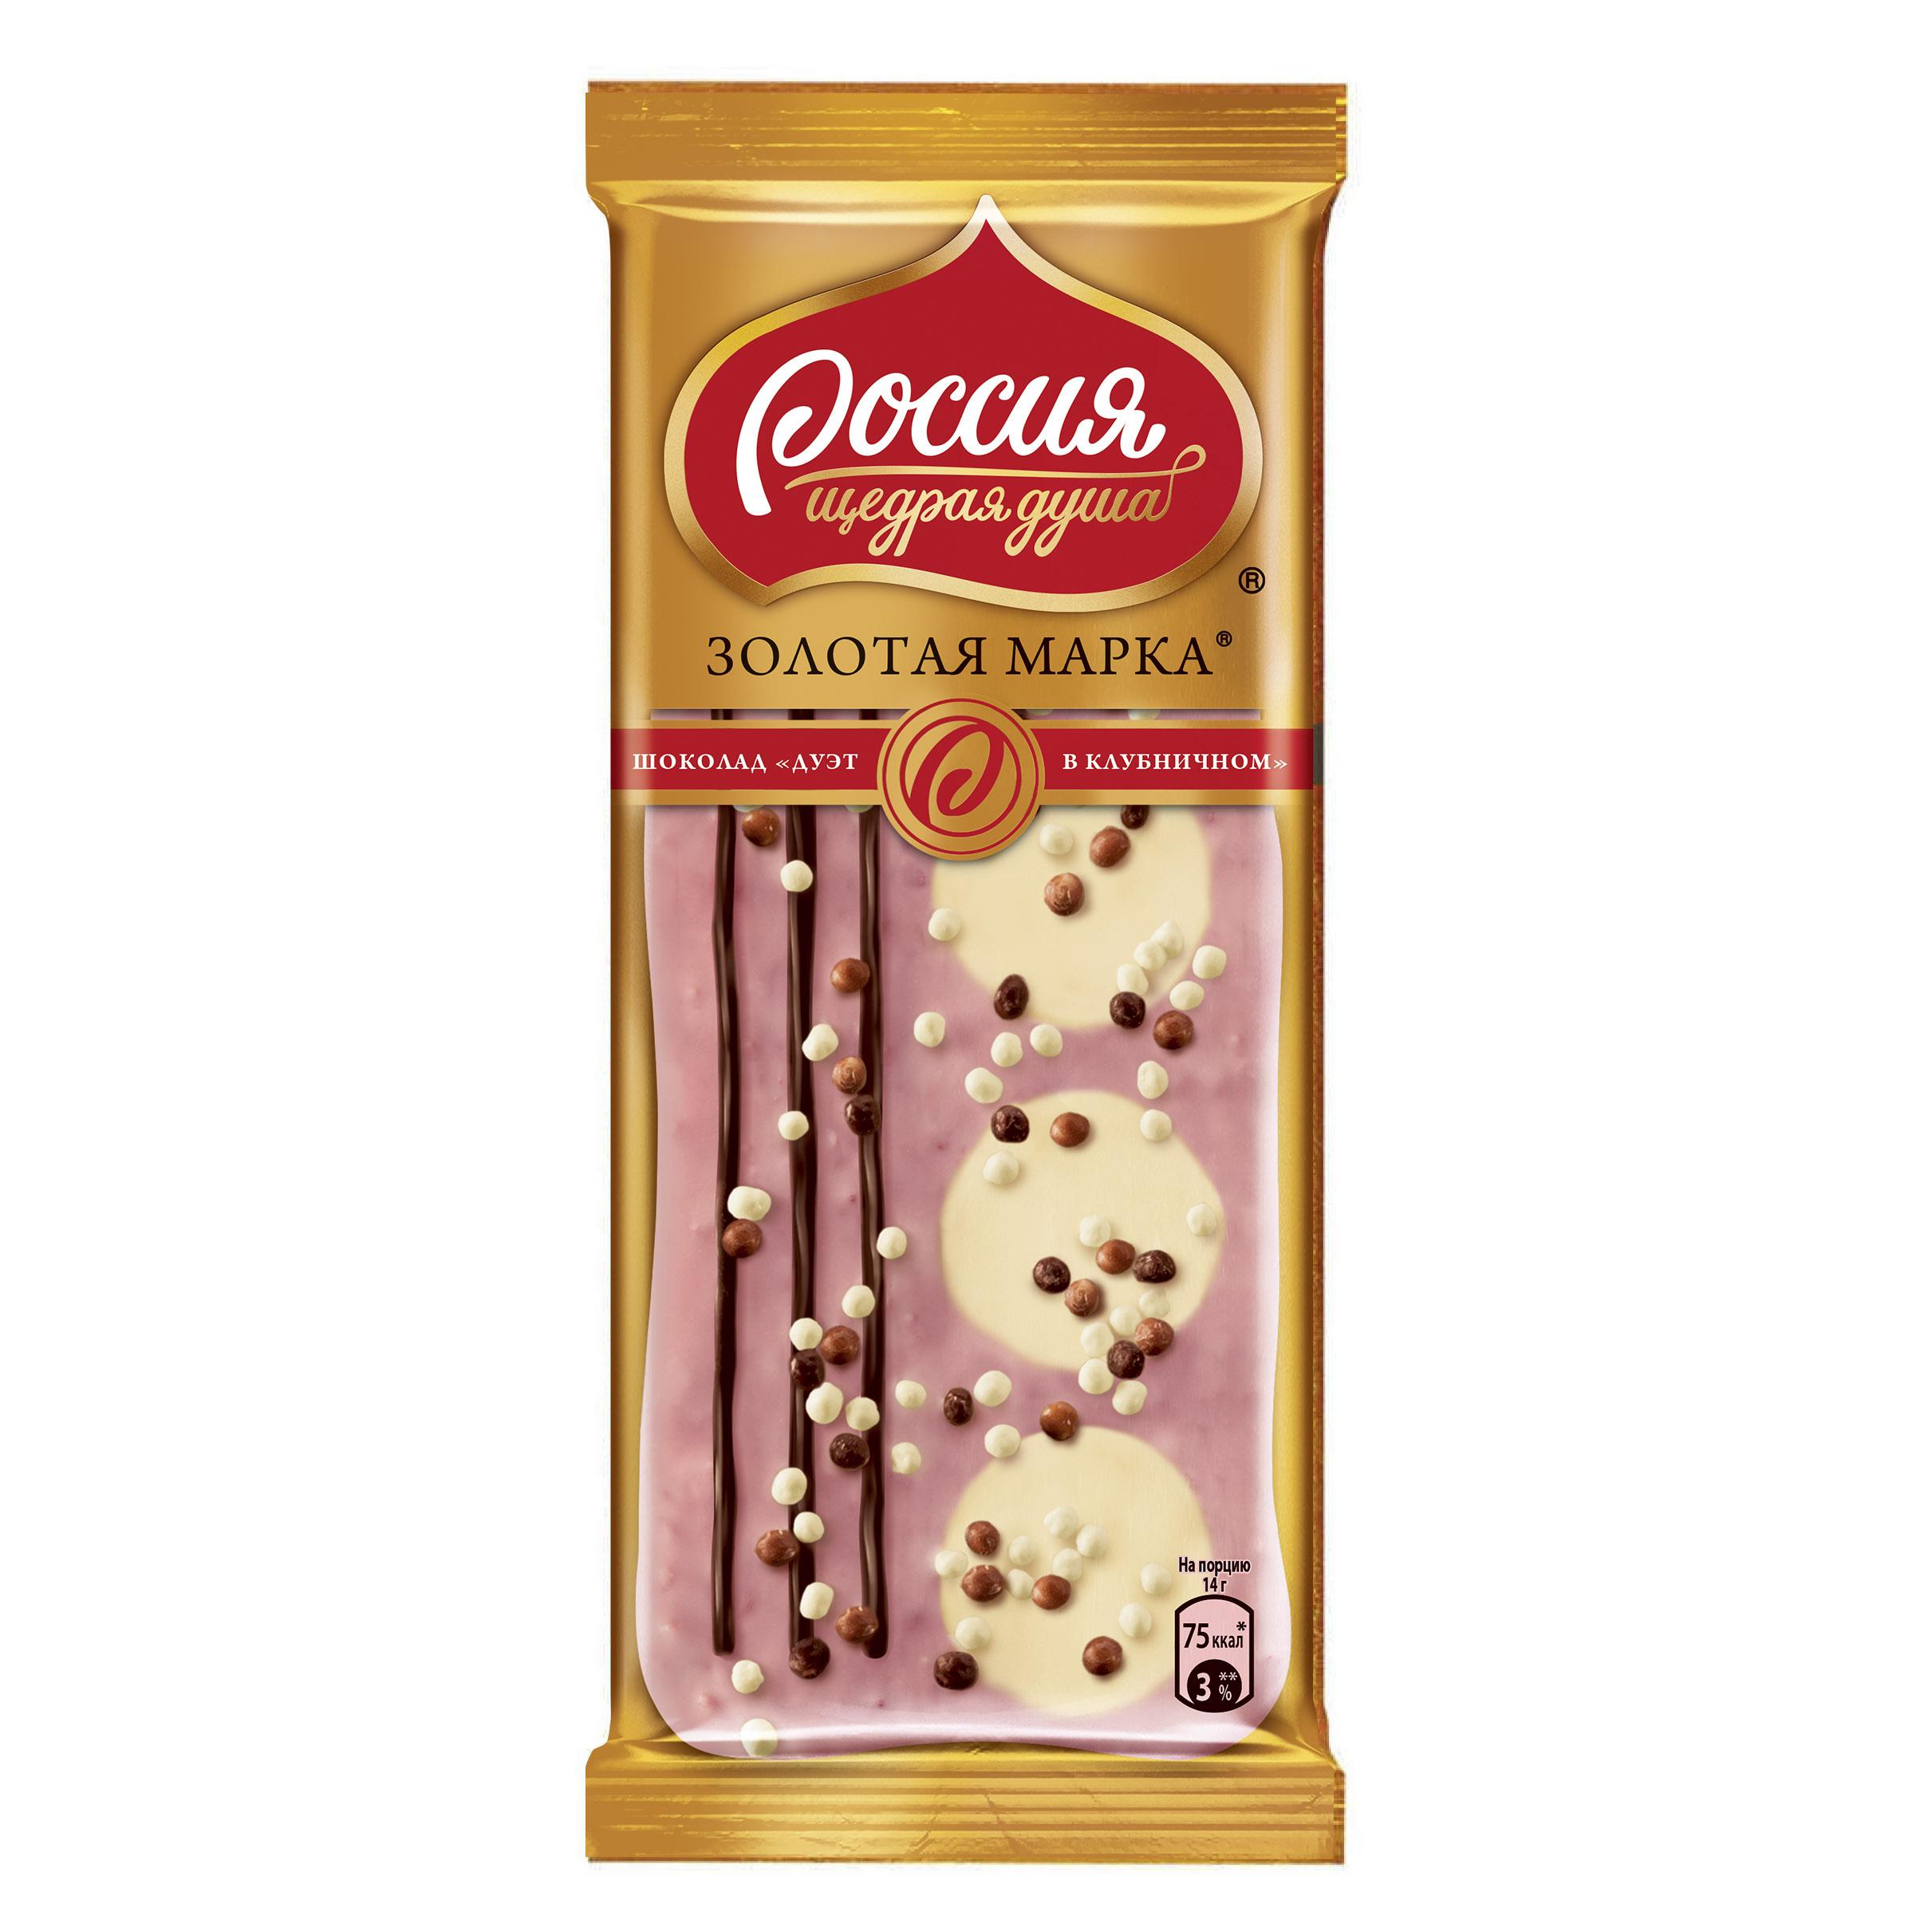 шоколад россия щедрая душа белый дуэт в карамельном 85 г Шоколад Россия щедрая душа Белый Дуэт в клубничном 85 г